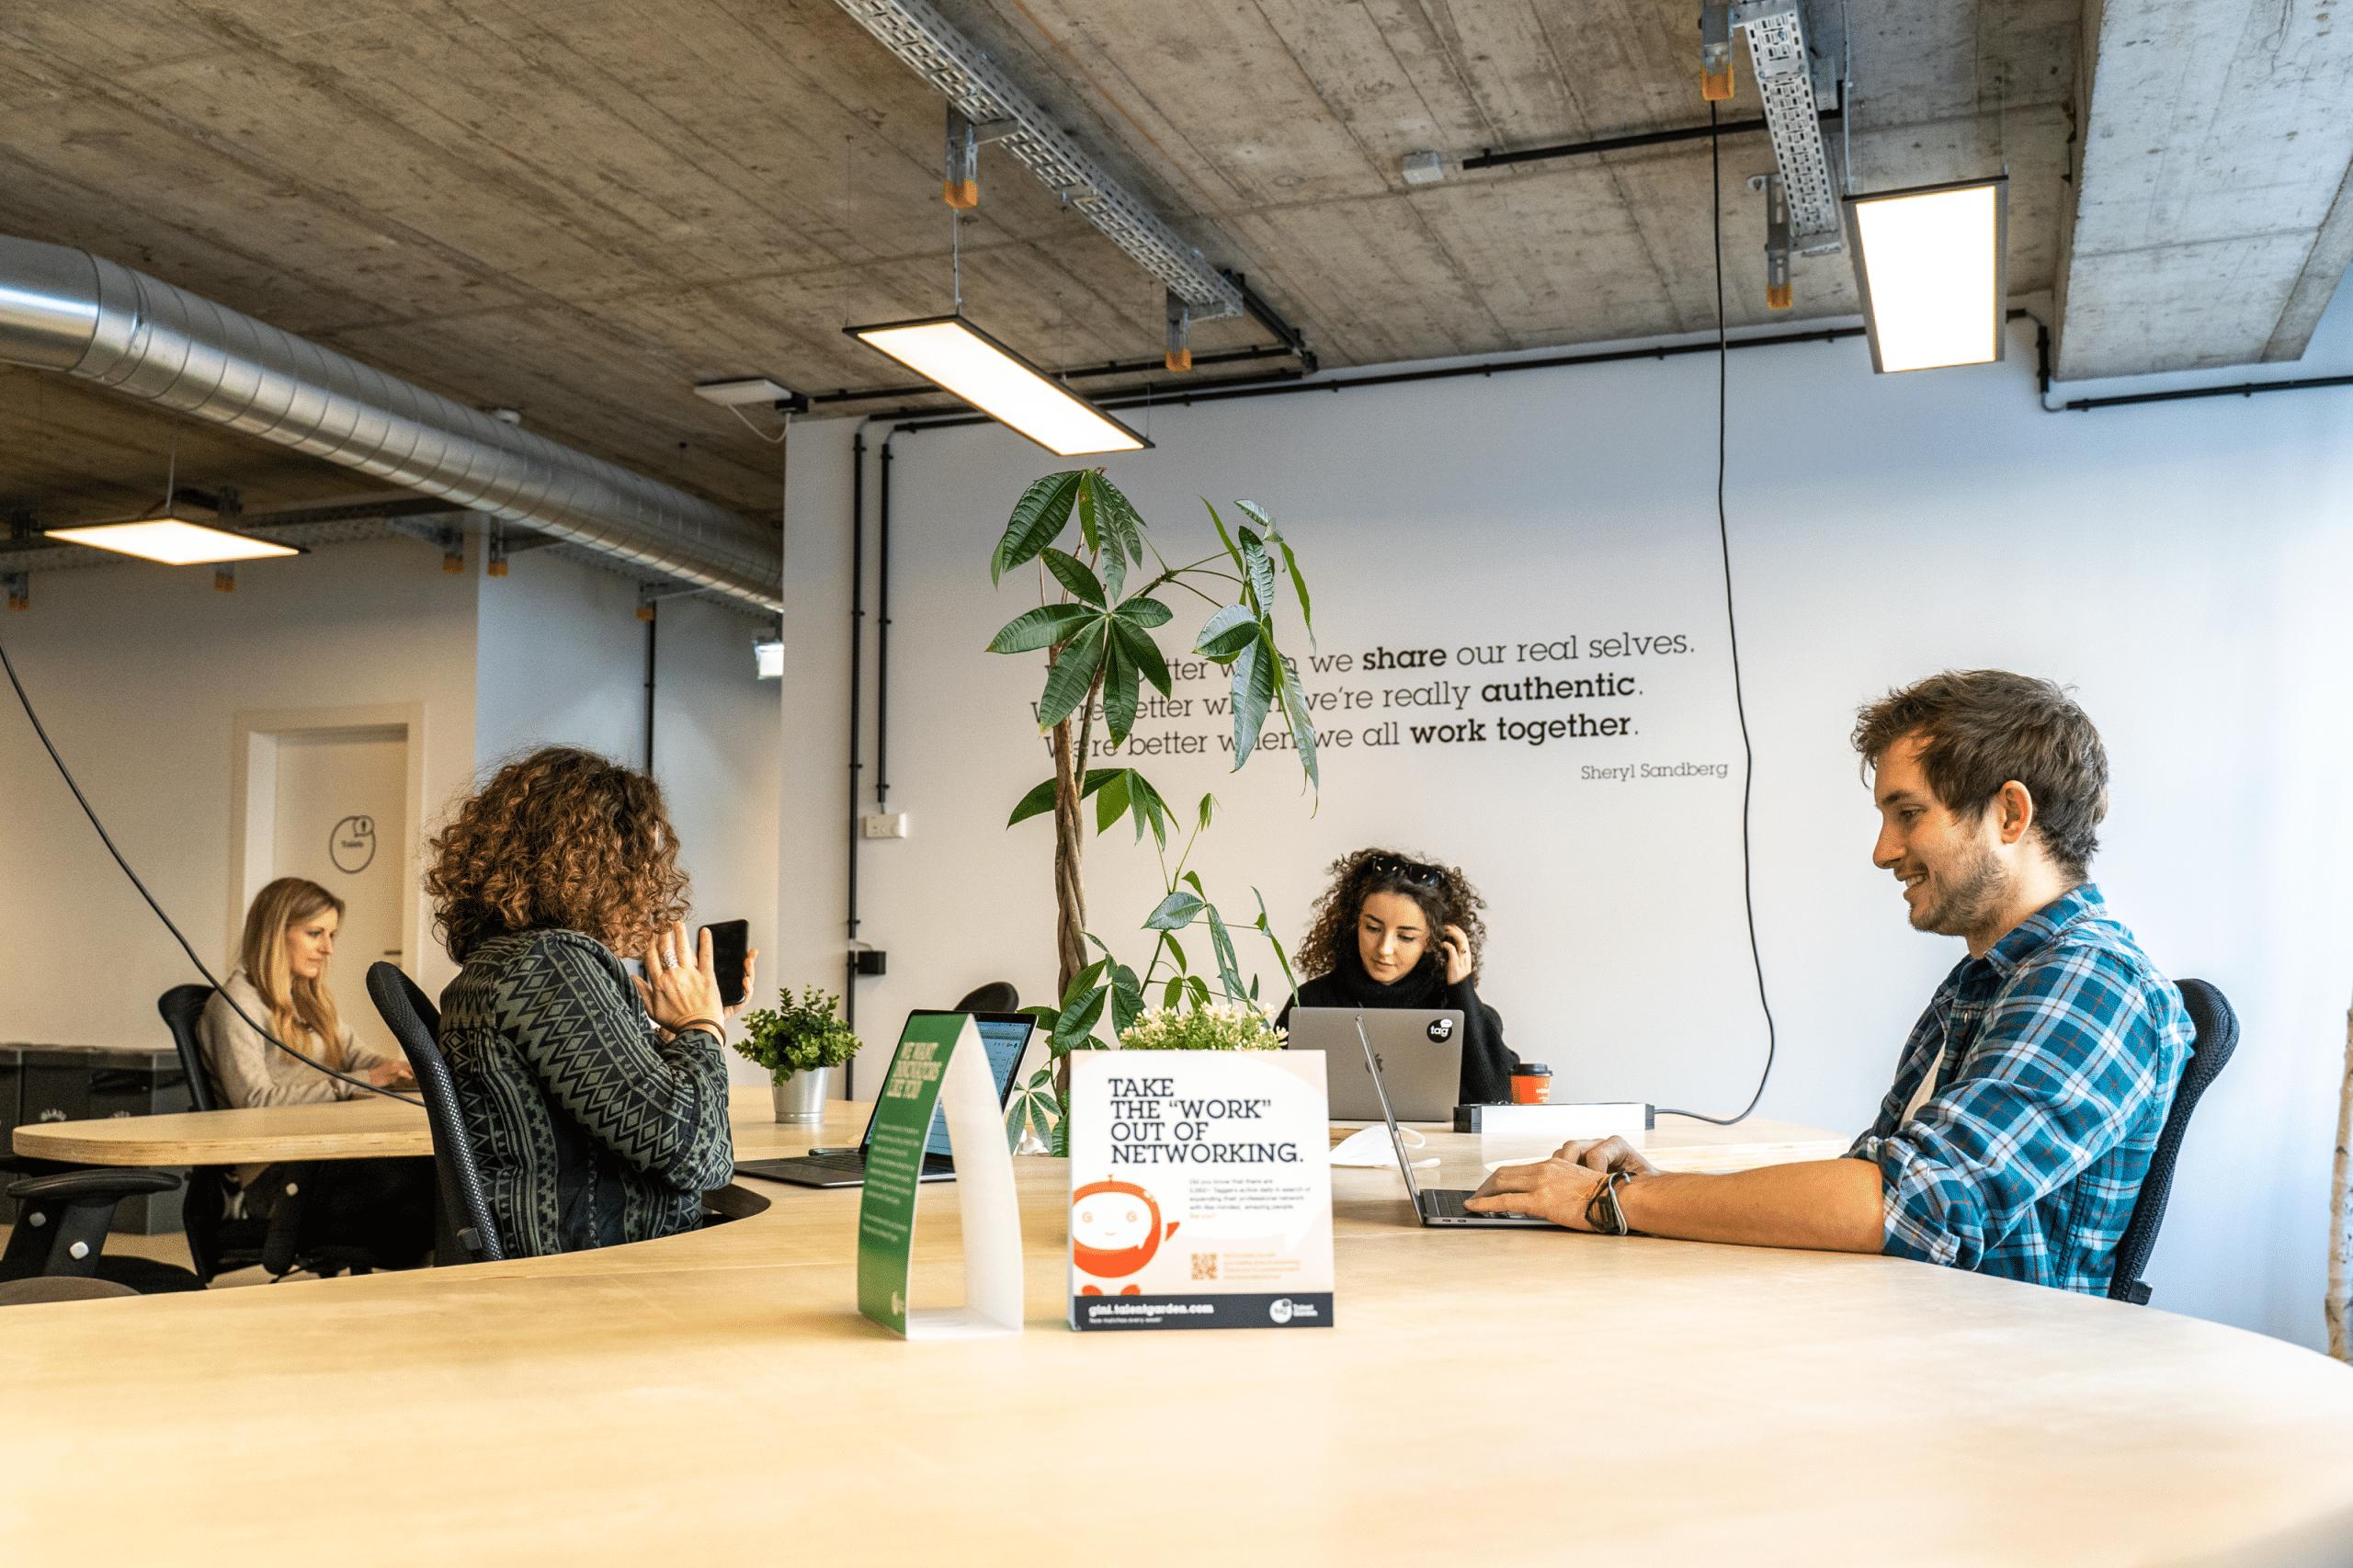 Wien Coworking Space